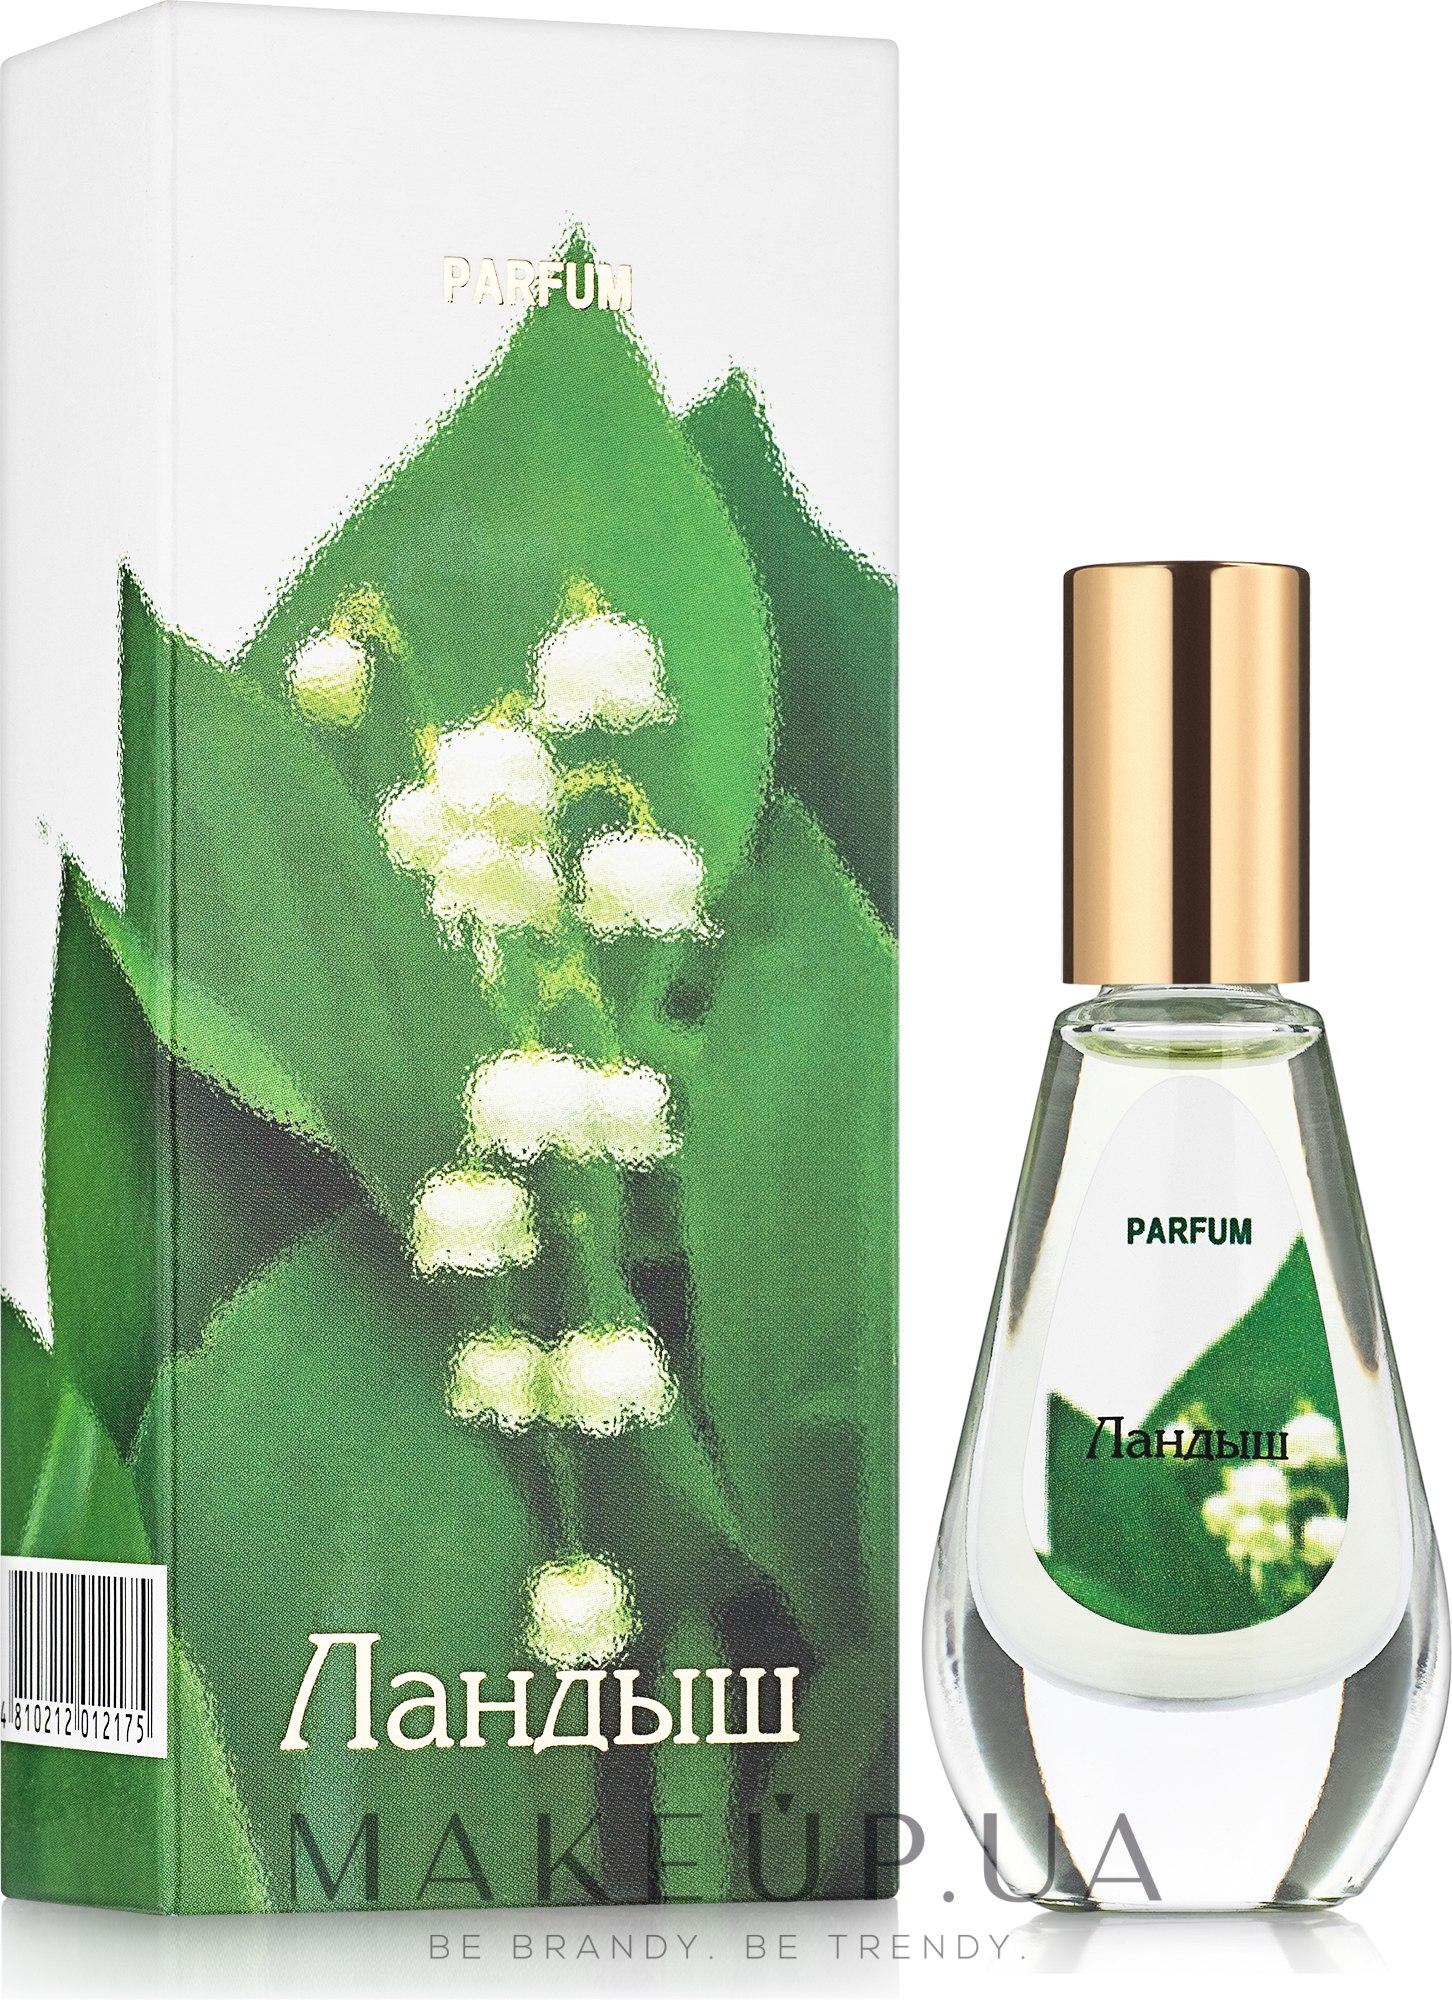 Dilis Parfum Floral Collection Ландыш - Духи — фото 9.5ml